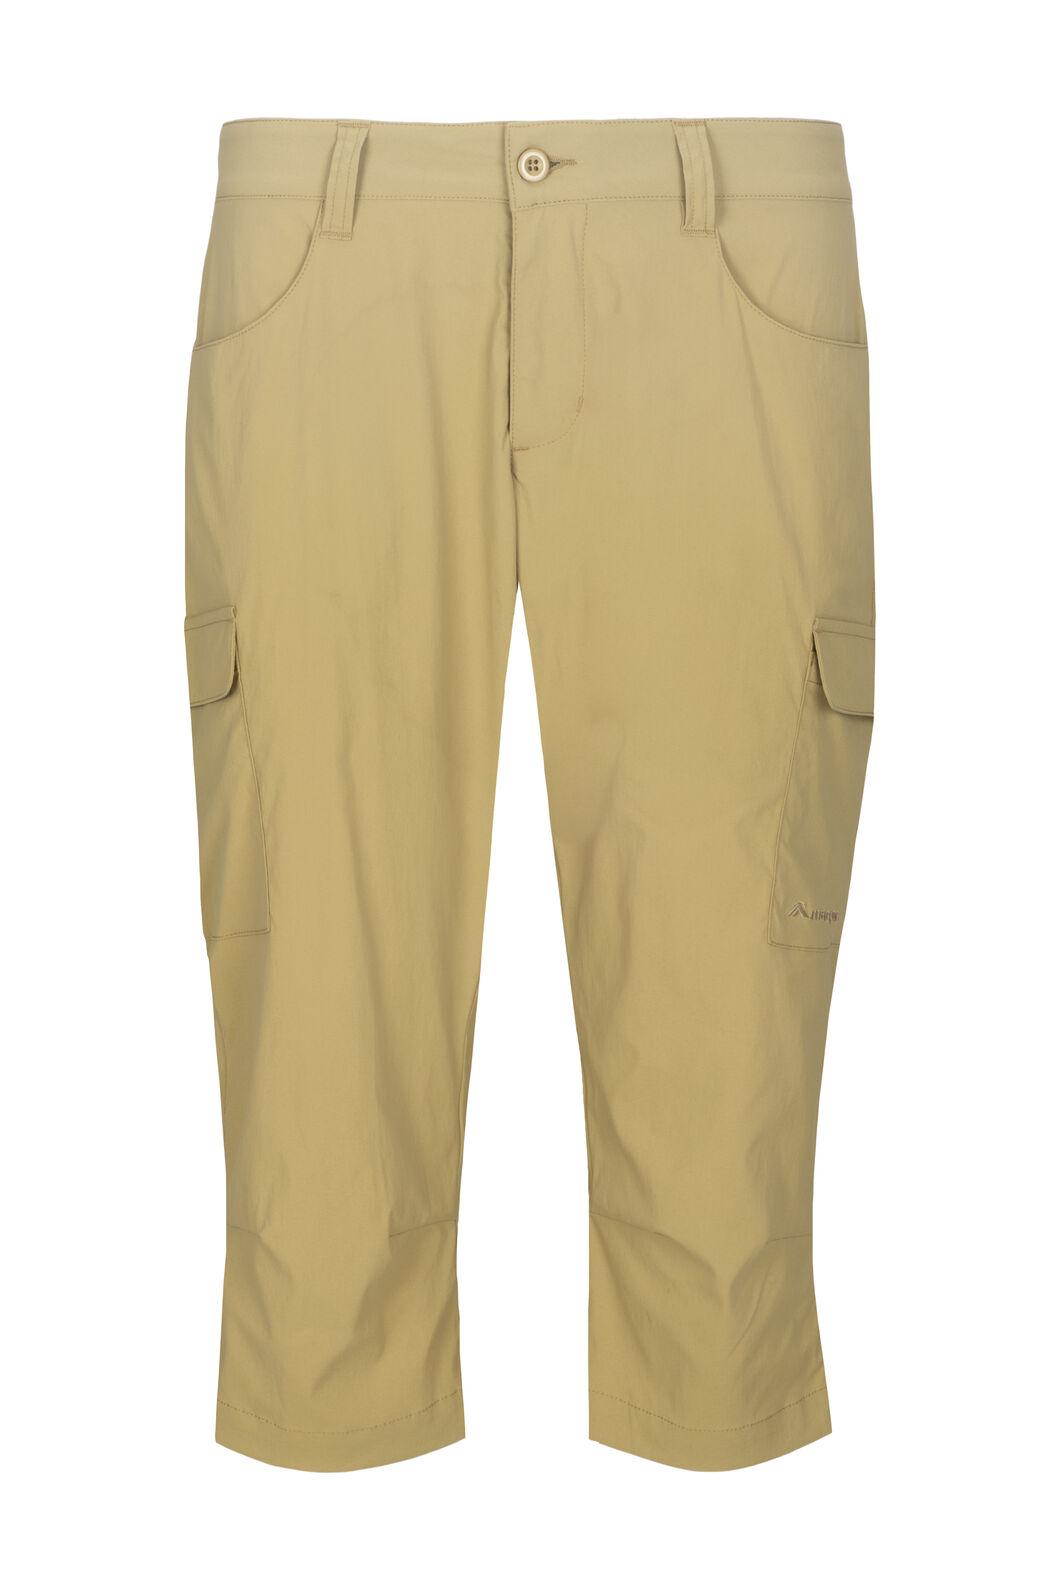 Macpac Women's Drift ¾ Pants, Khaki, hi-res